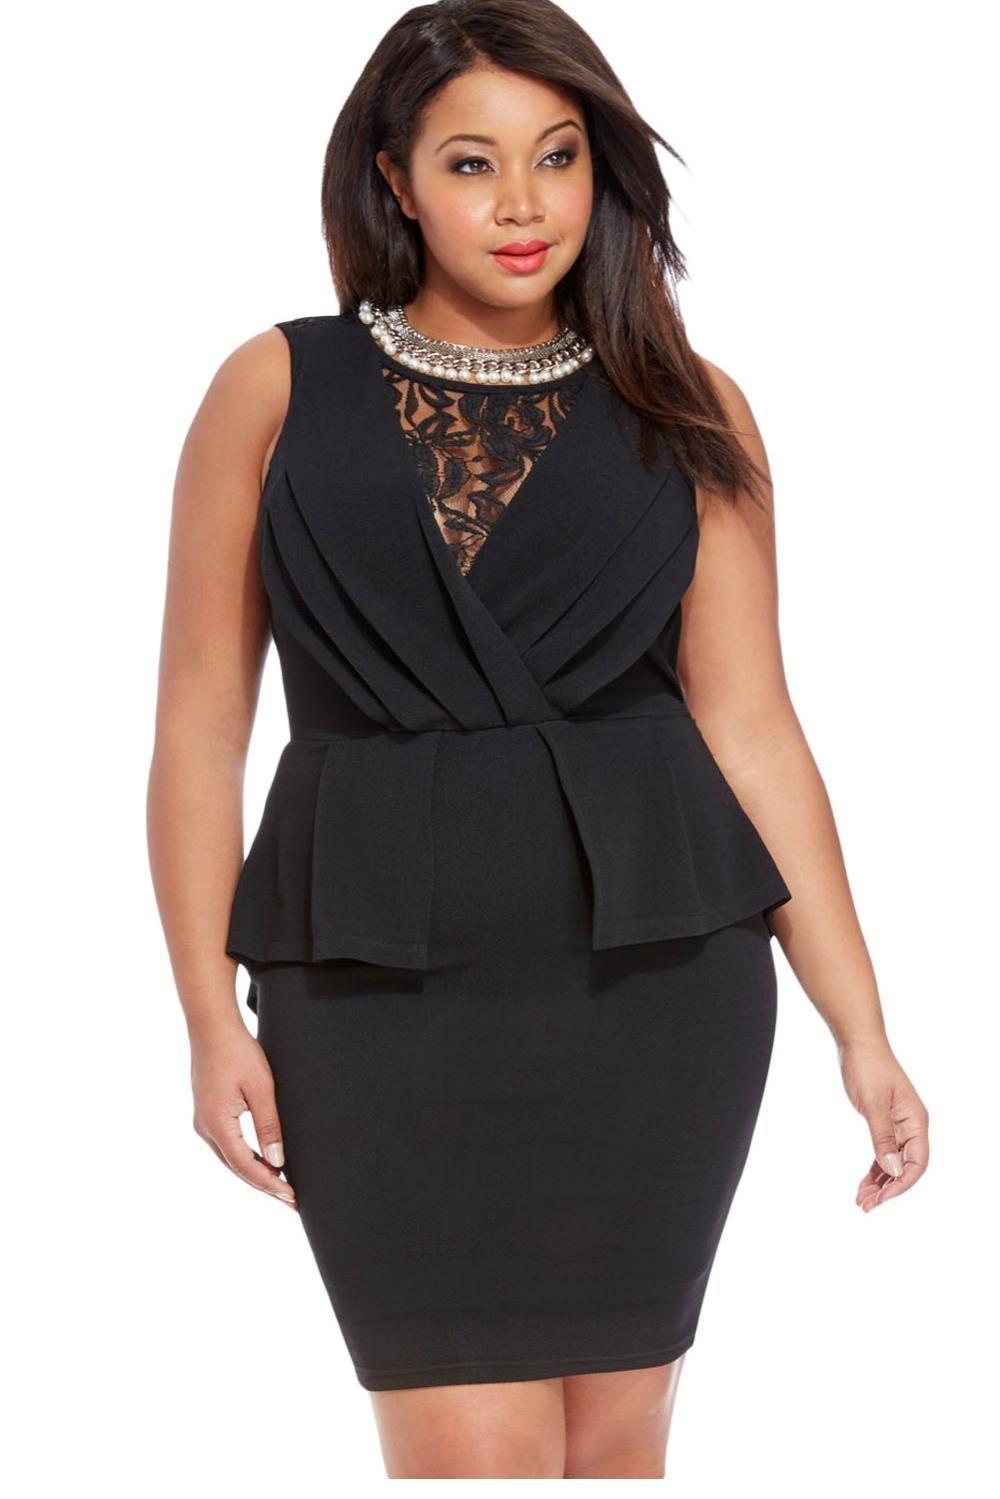 hot summer woman lace detail plus size little black peplum dress